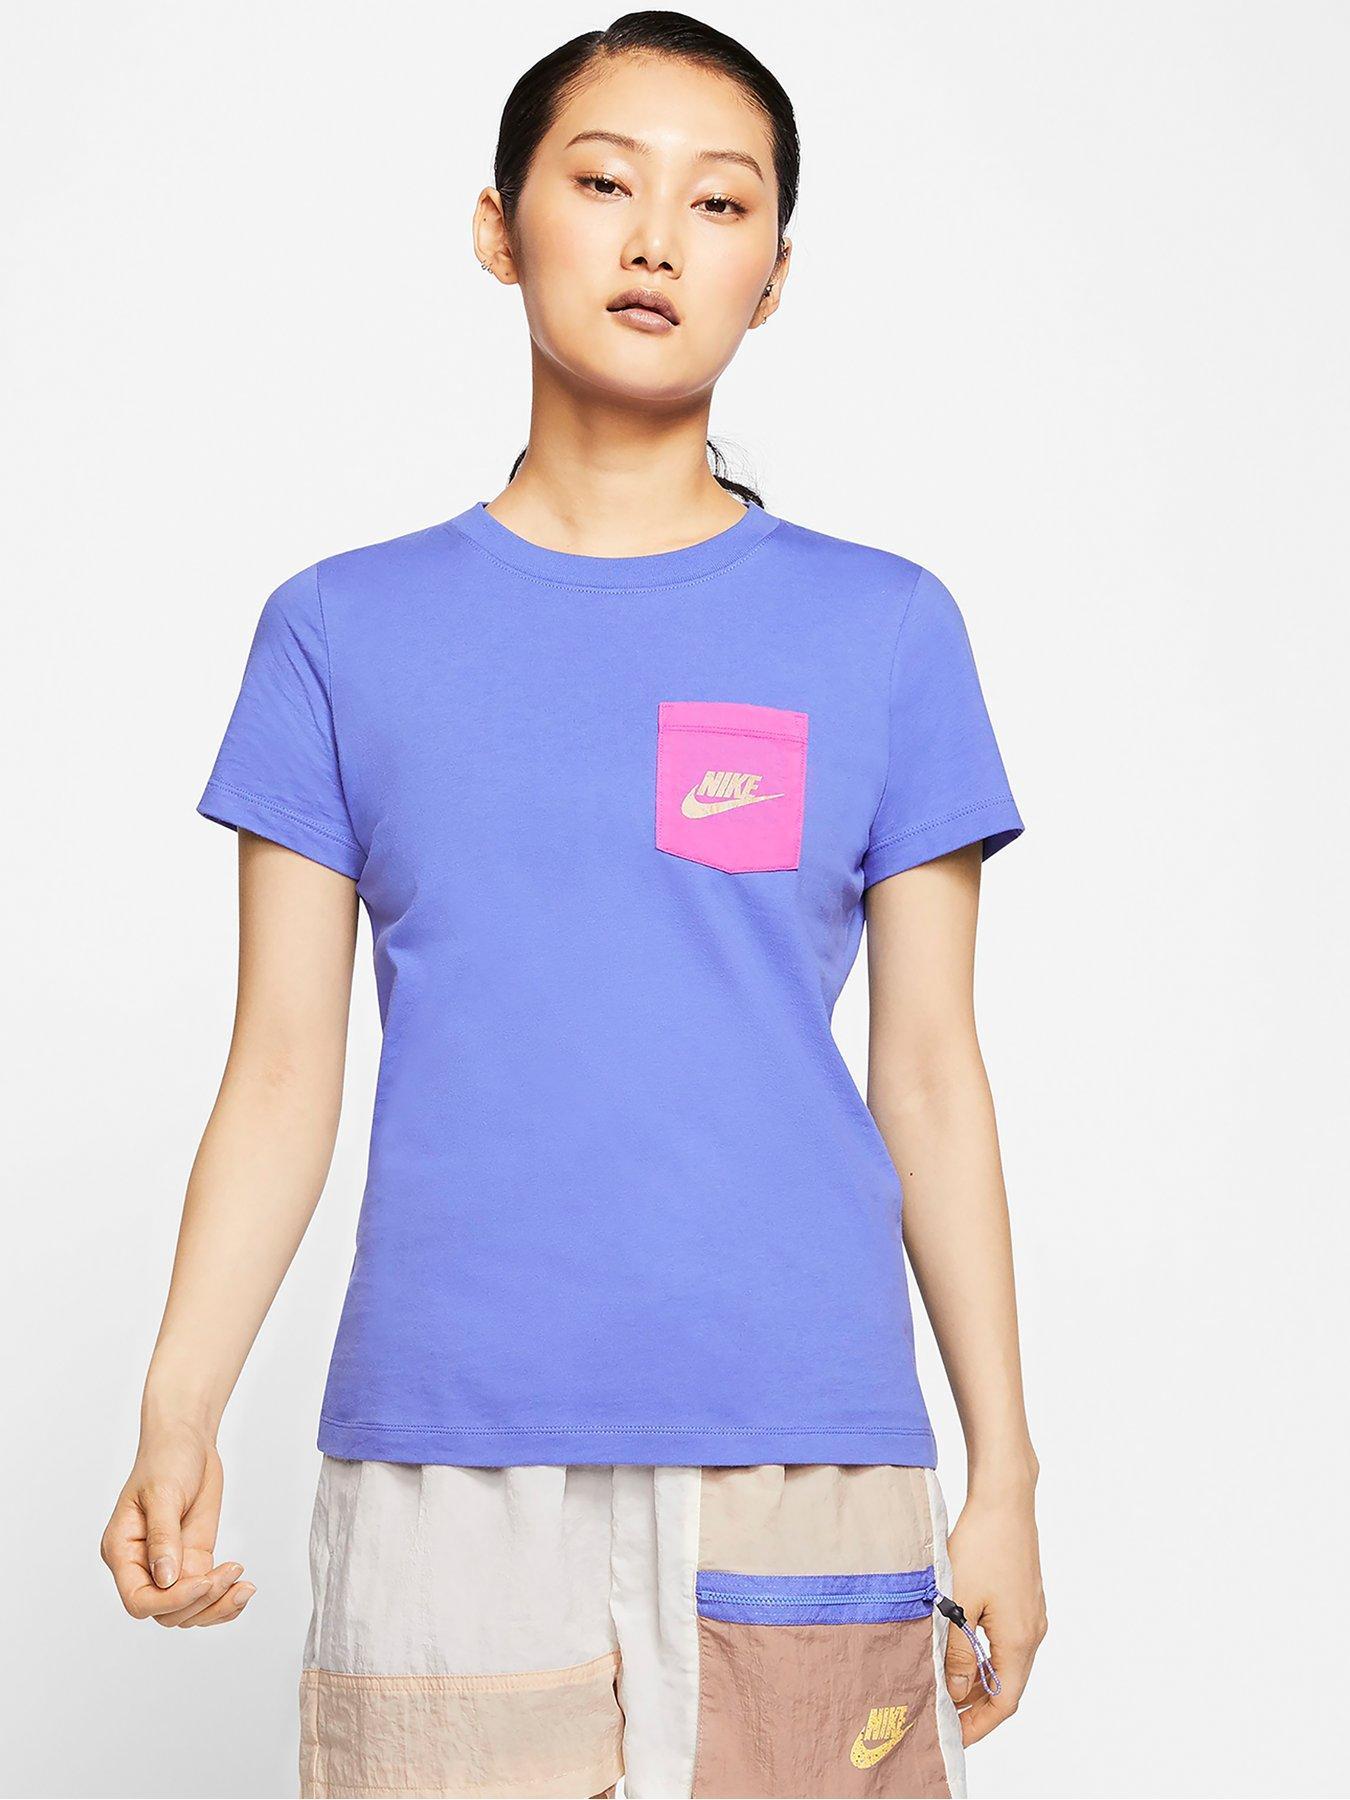 Nike Boys Still Fresh Futura Graphic Cotton Shirt Blue//Silver New